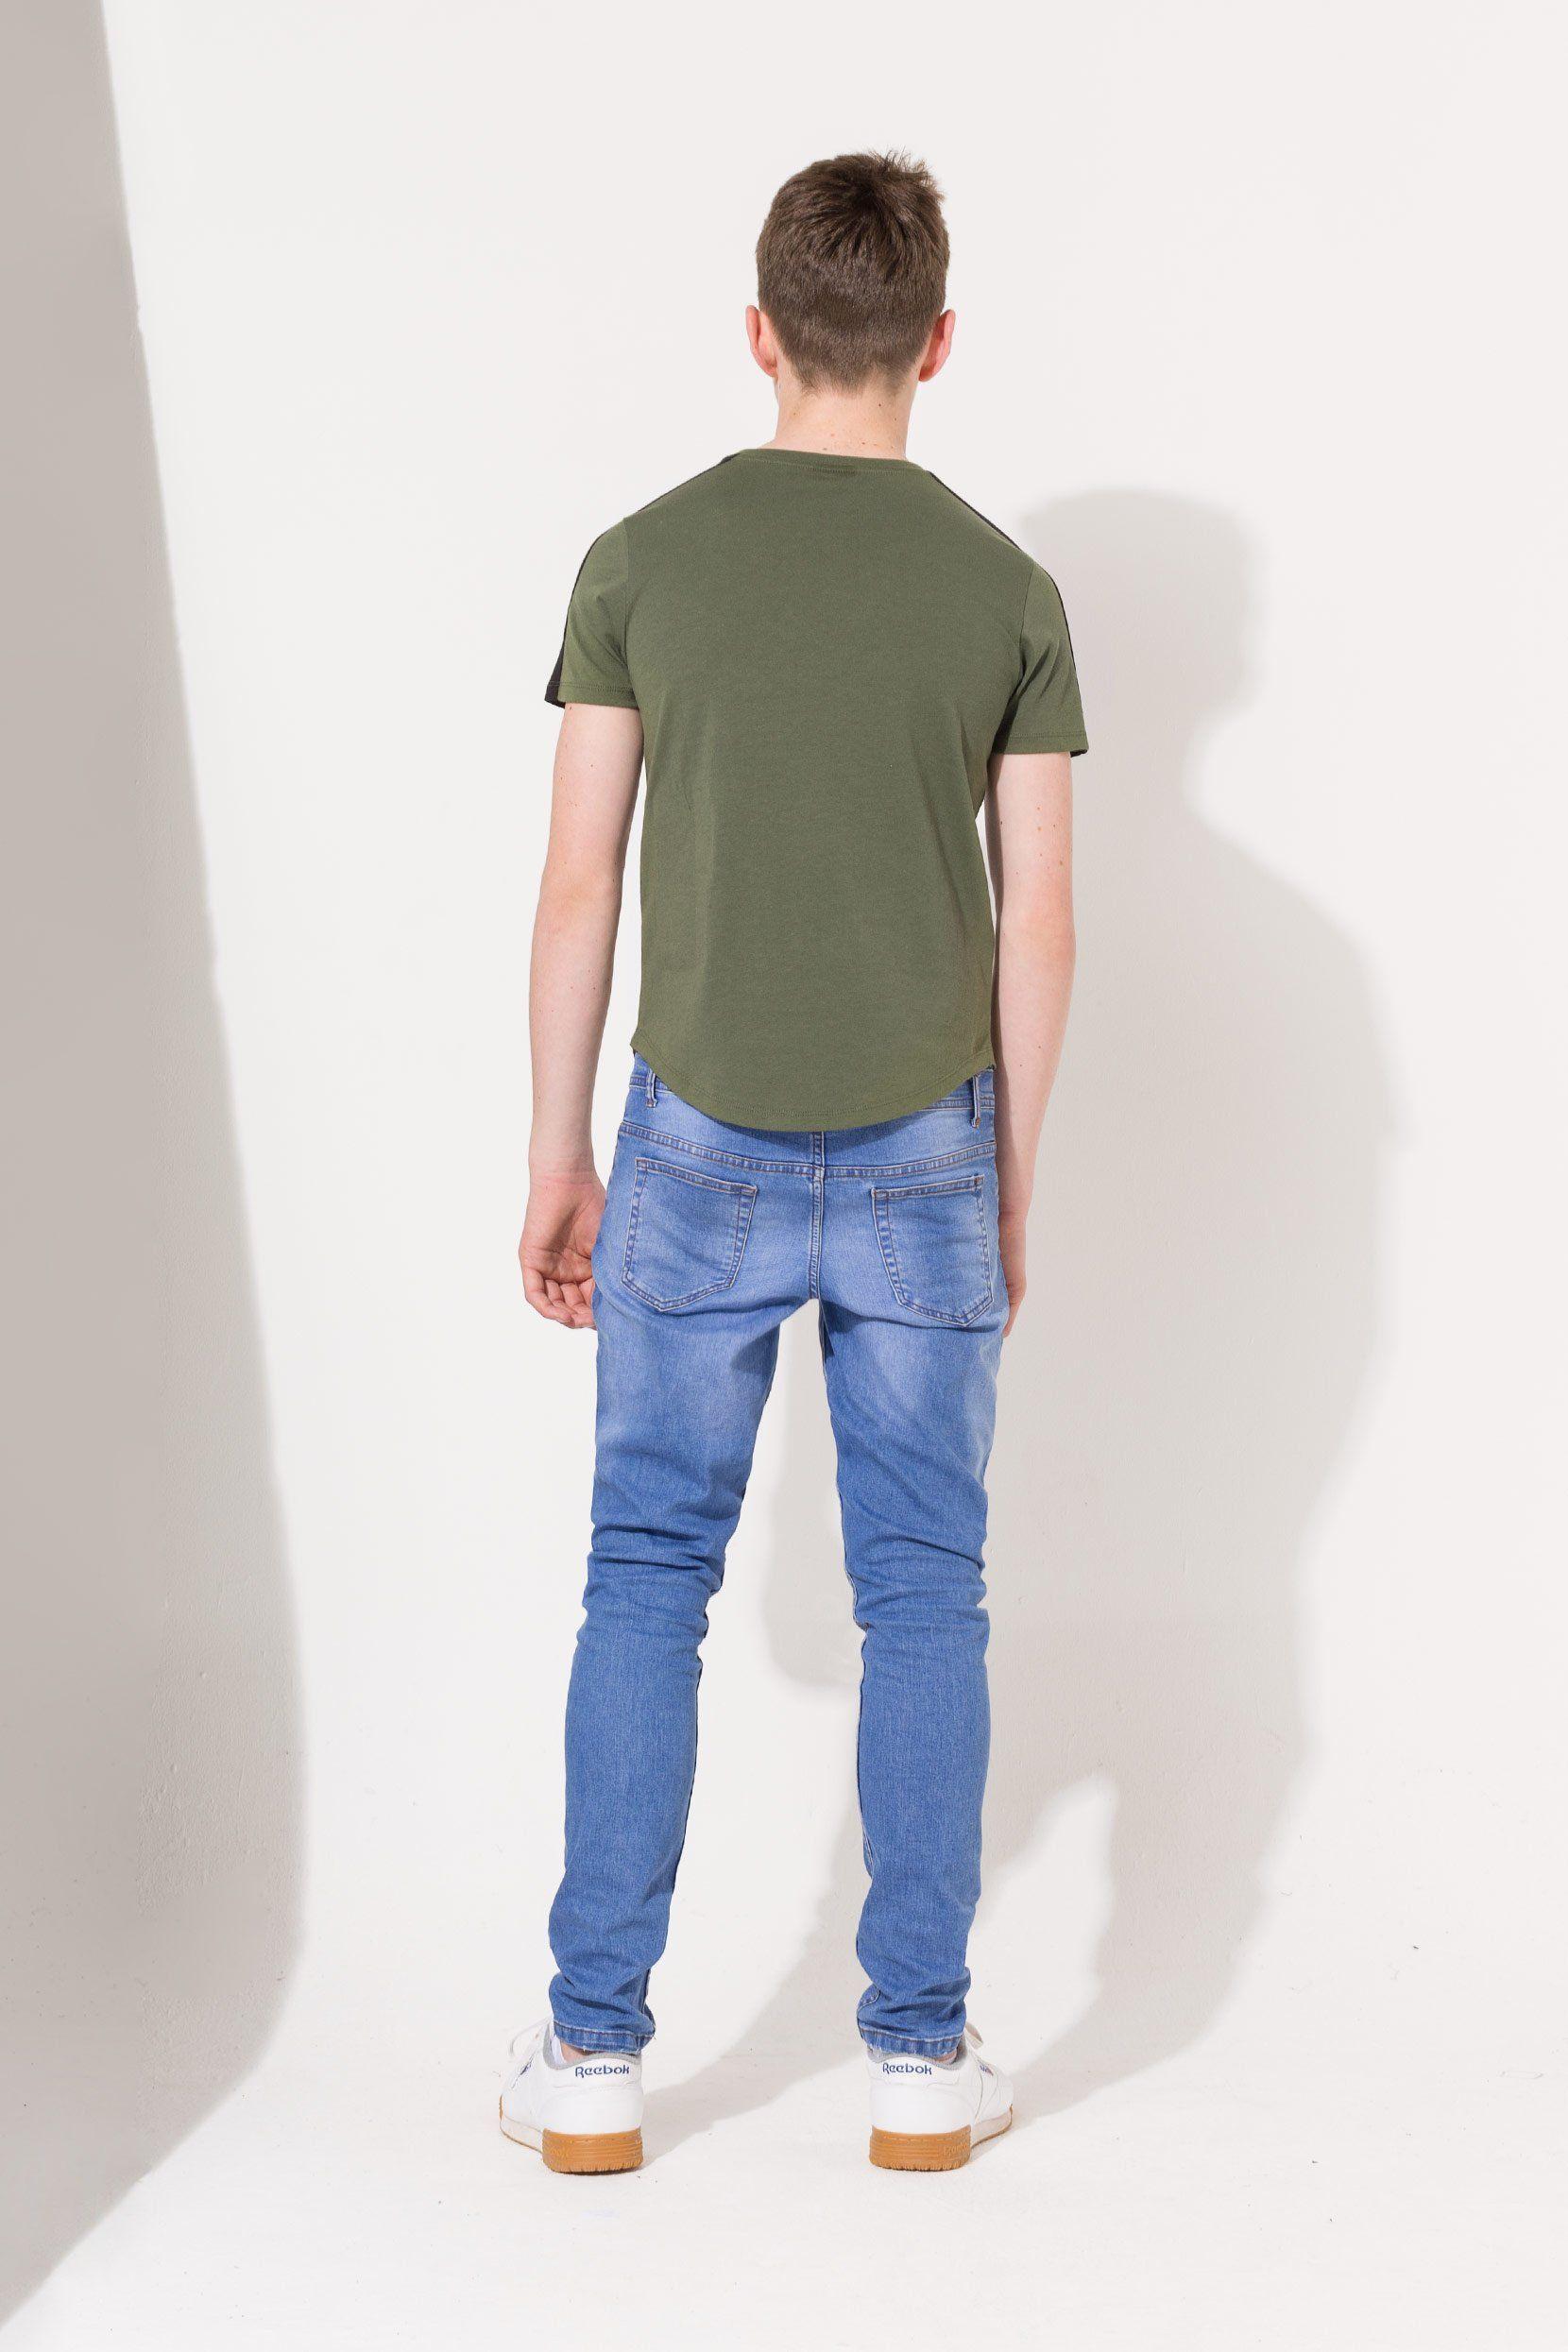 Hype Khaki Side Stripe Crest Kids T-Shirt